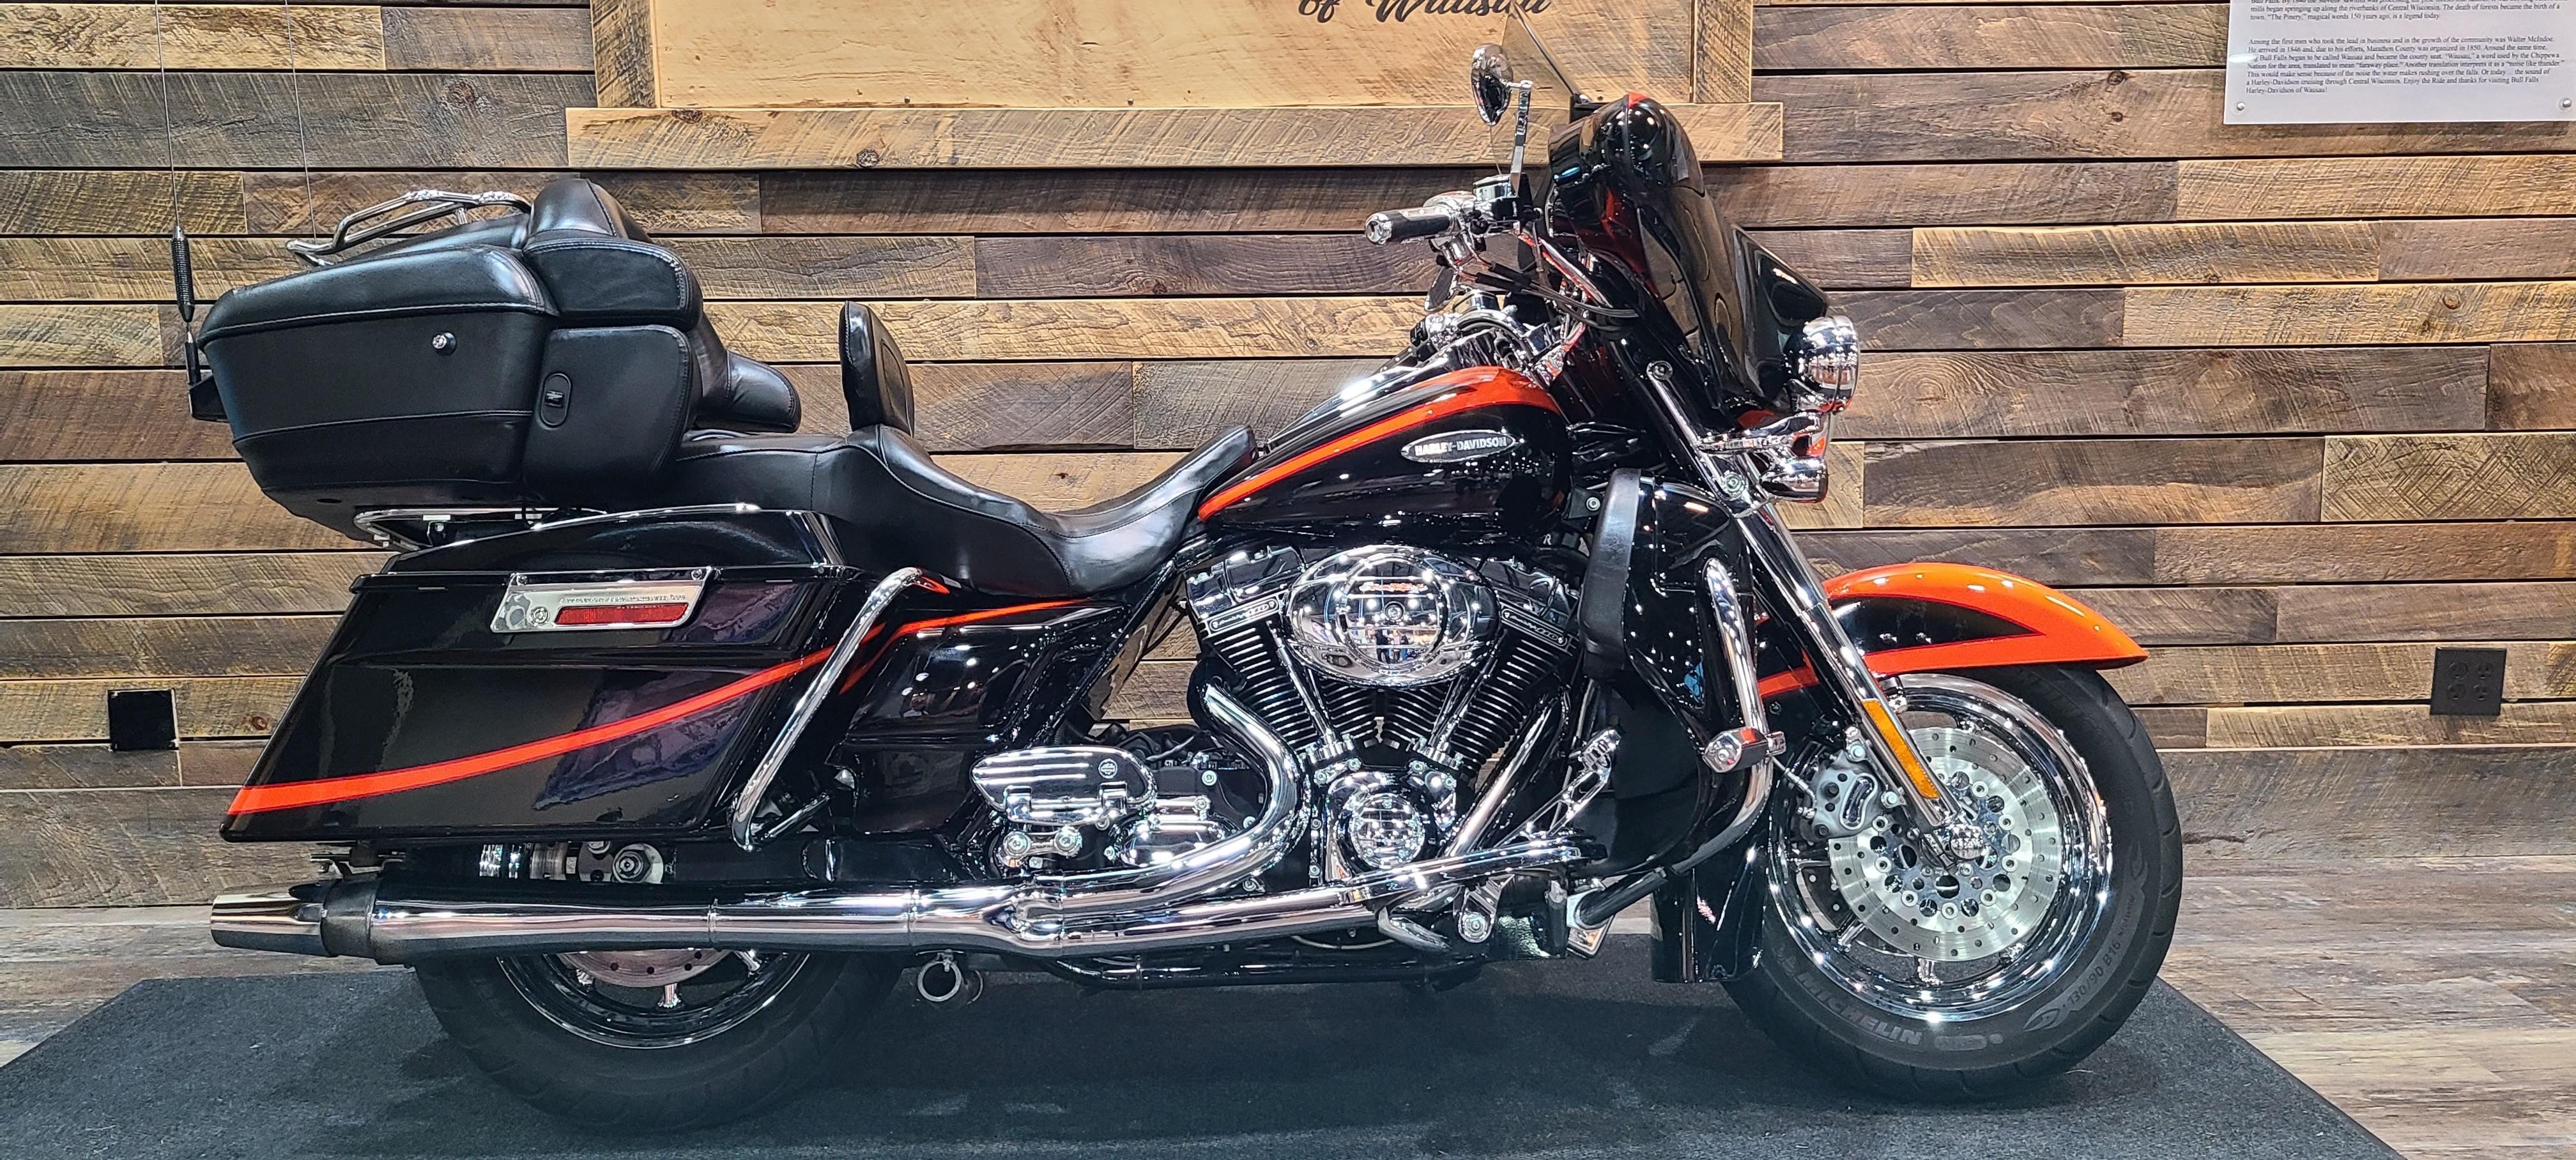 2007 Harley-Davidson FLHTCUSE2 at Bull Falls Harley-Davidson